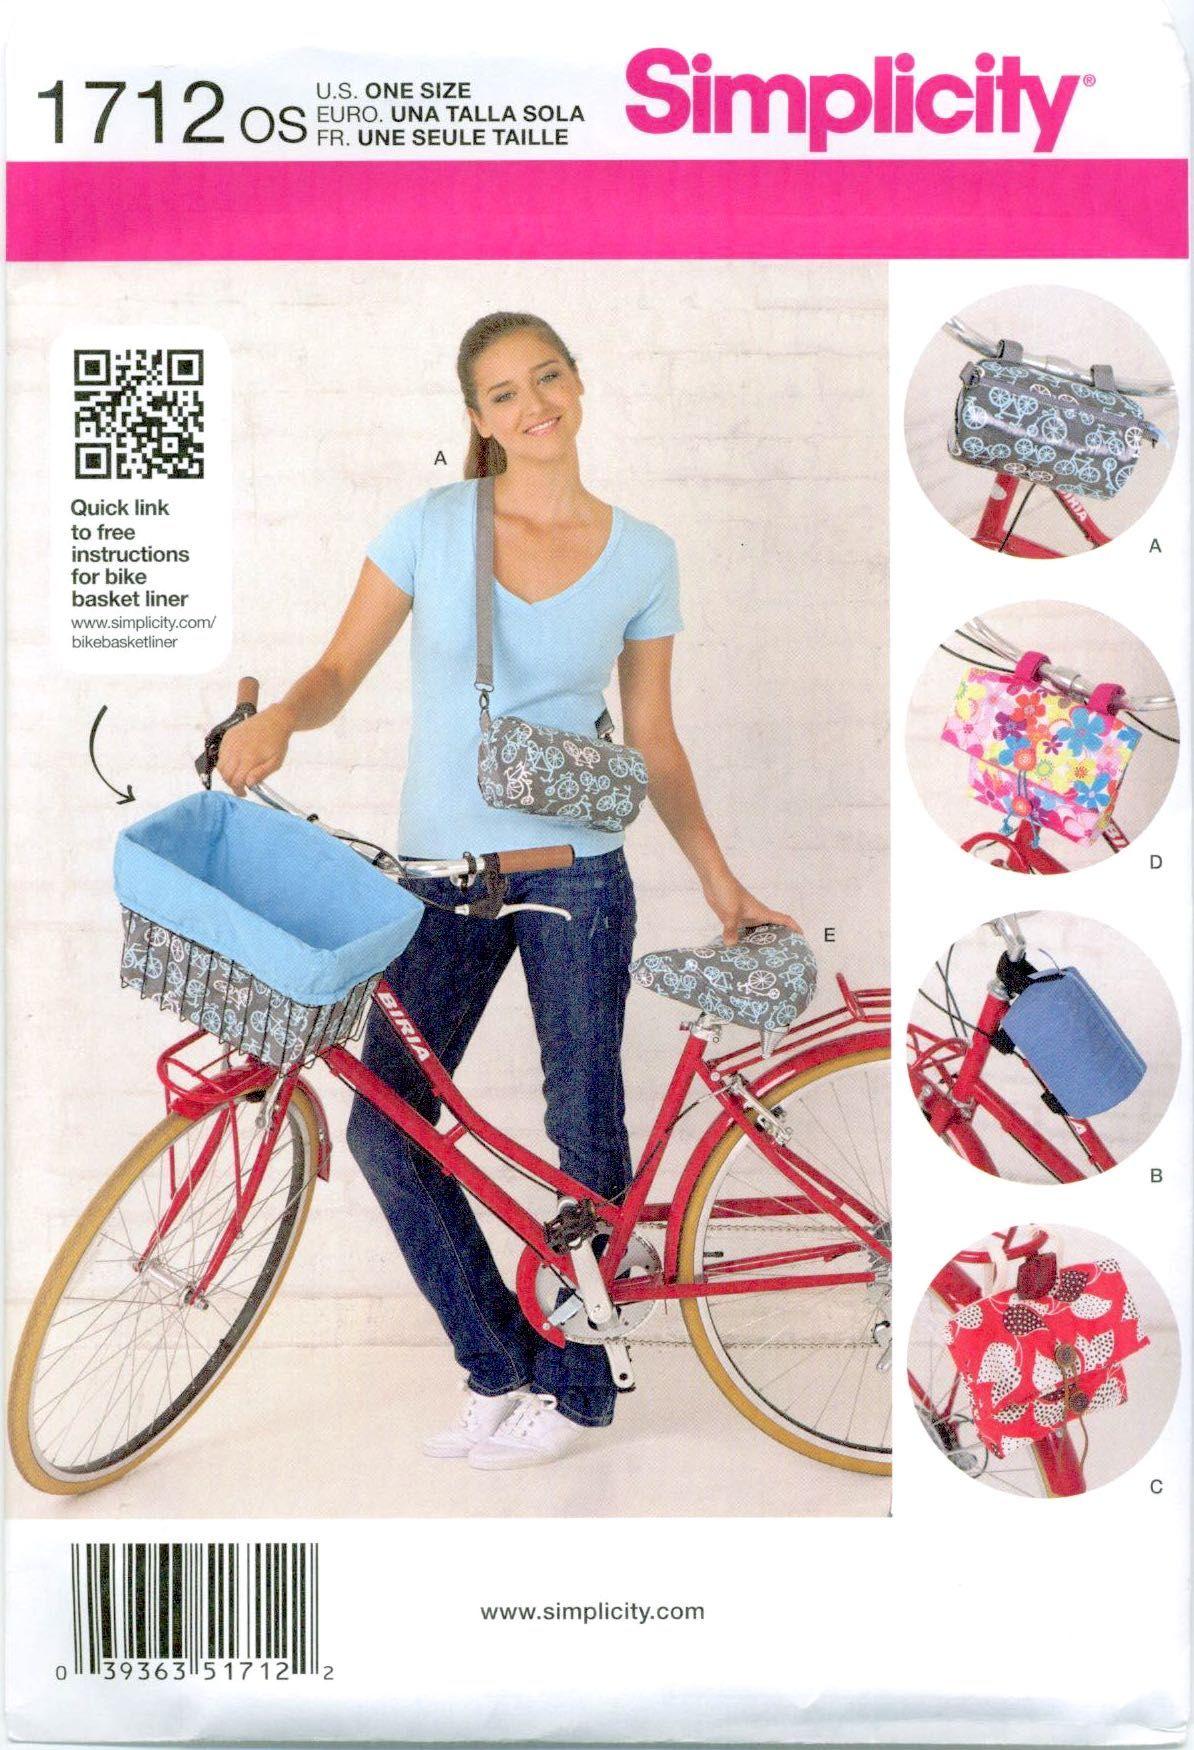 Simplicity 1712 Bicycle Bike Handlebar Bags Seat Cover Sewing Pattern Uncut Ff In 2020 Bike Basket Liner Diy Sewing Pattern Sewing Patterns